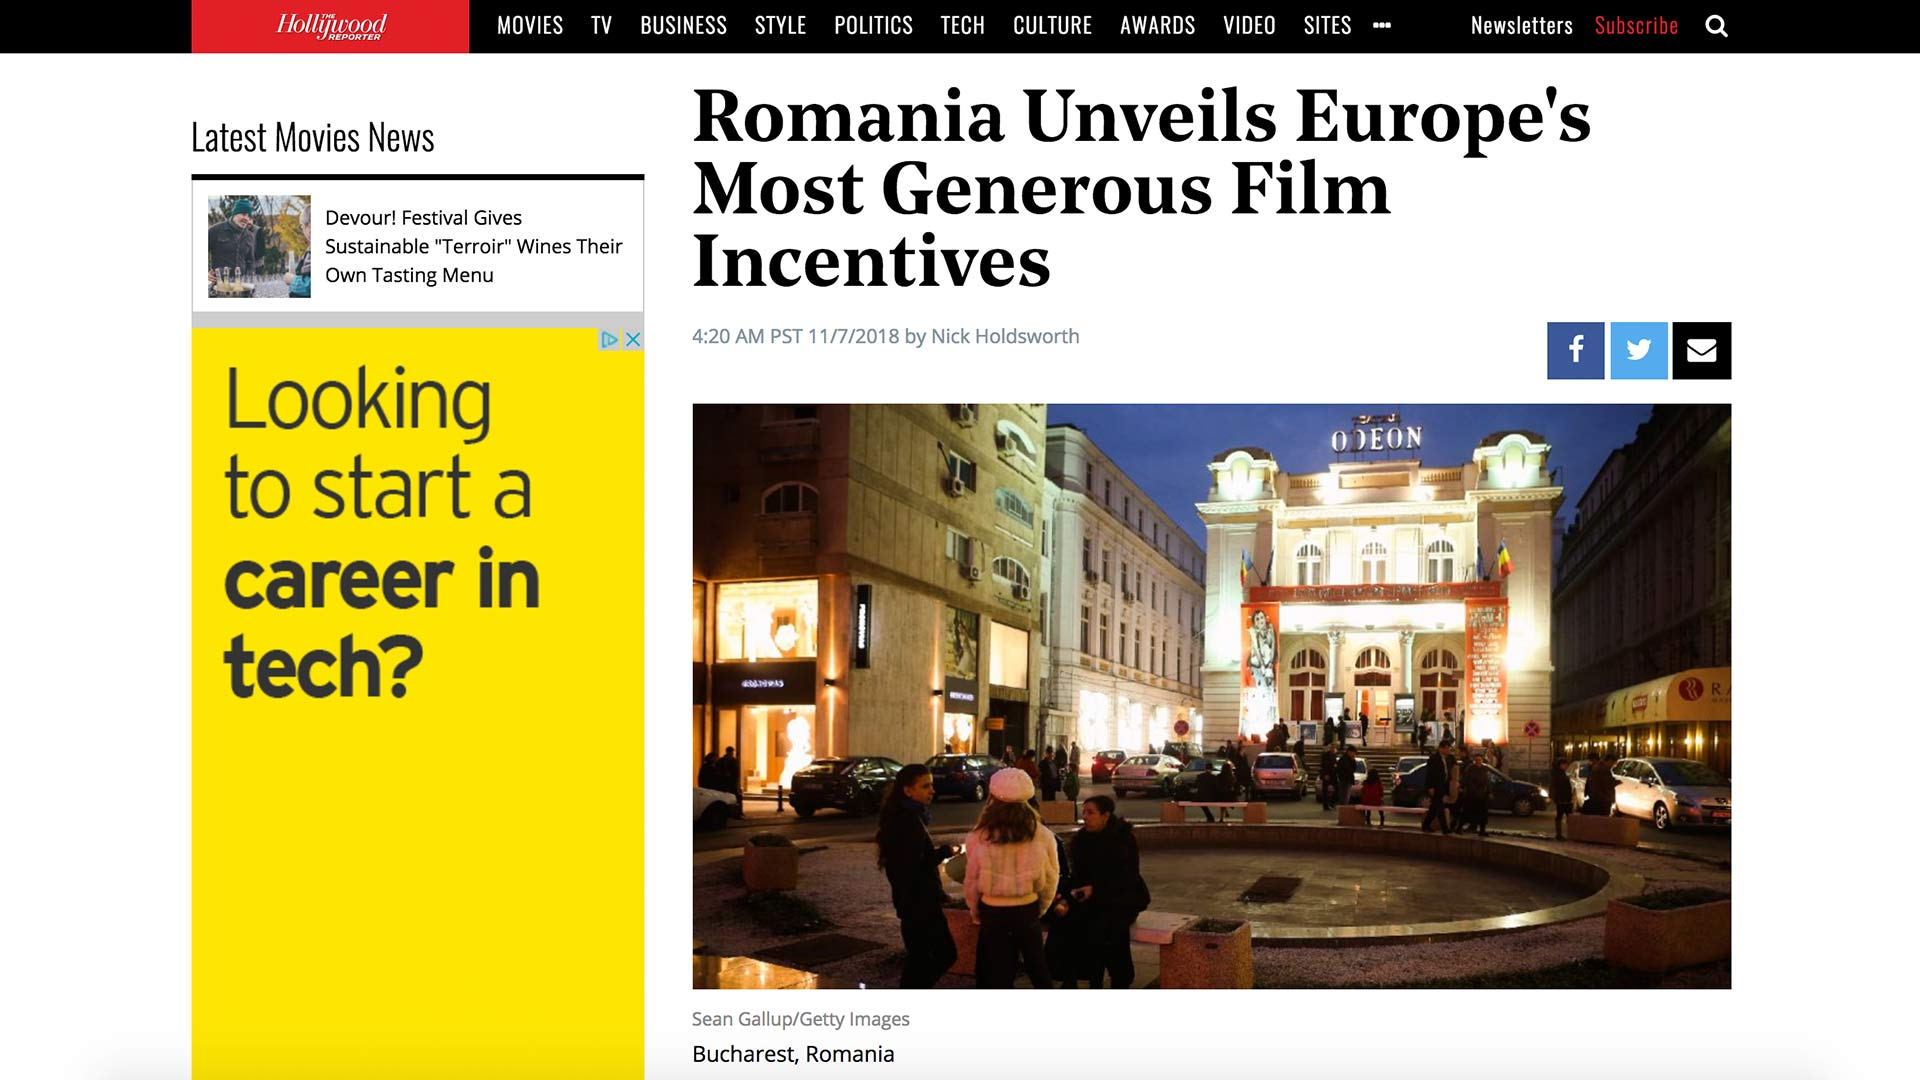 Fairness Rocks News Romania Unveils Europe's Most Generous Film Incentives